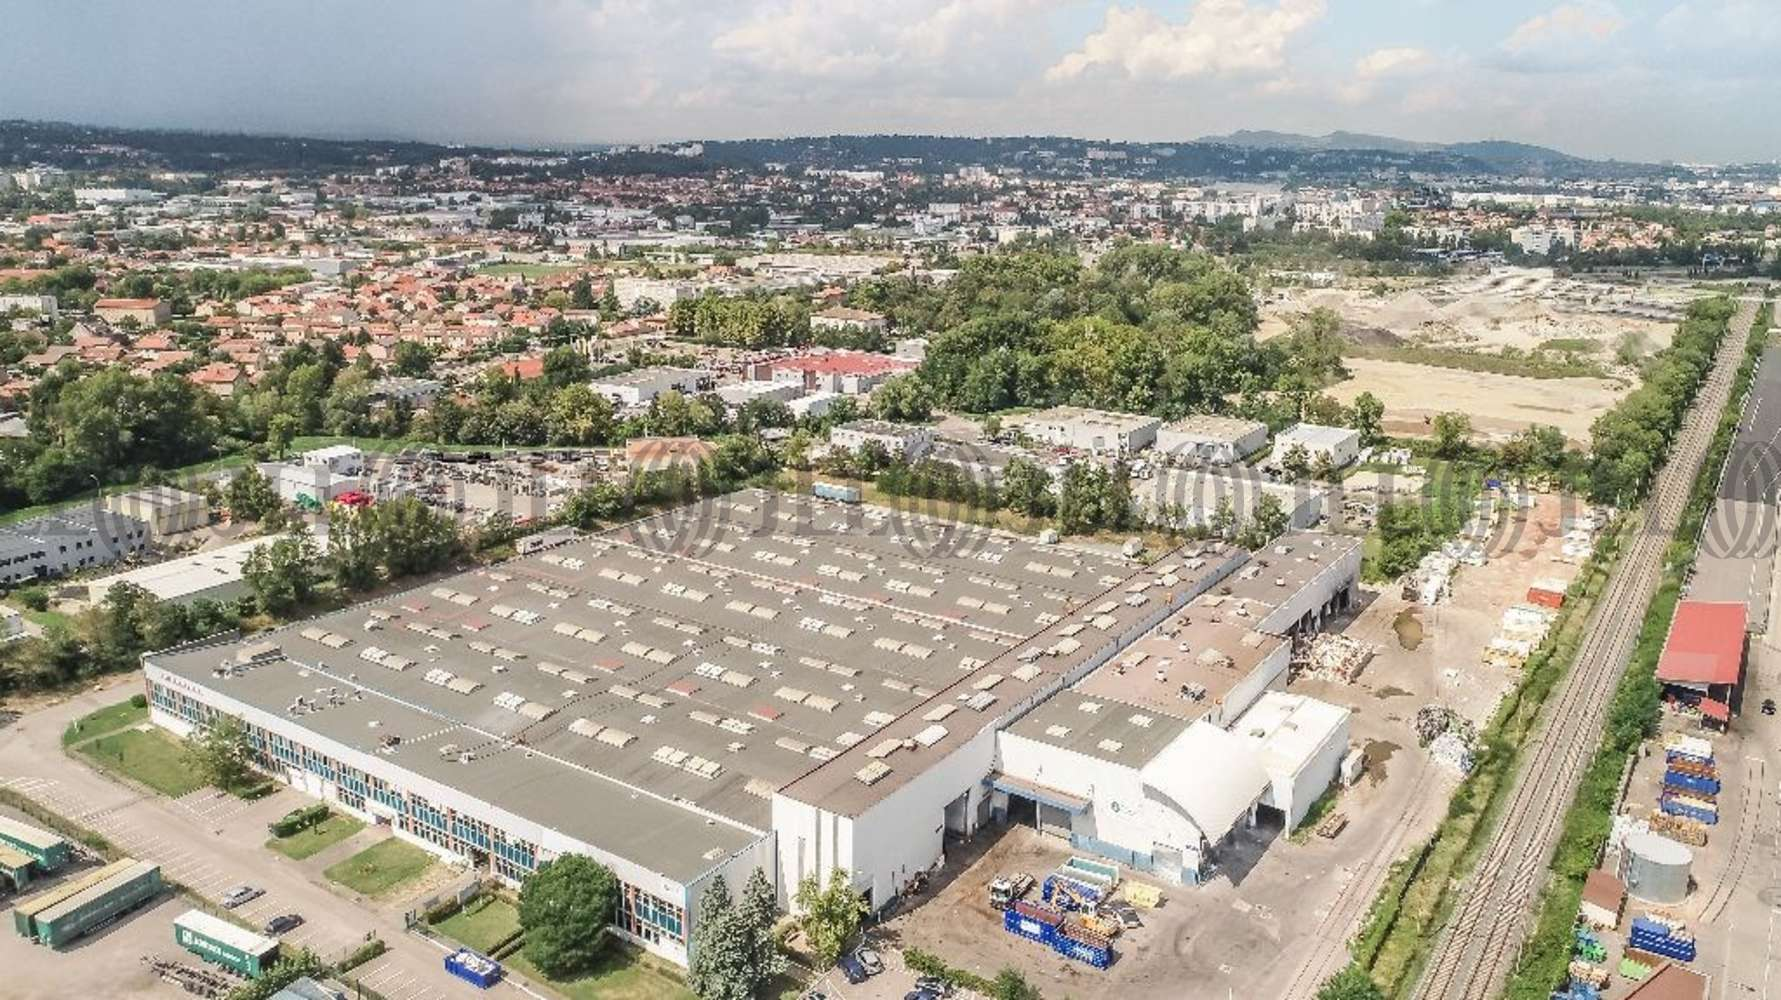 Plateformes logistiques Irigny, 69540 - Entrepot à vendre Lyon Sud - Irigny - 9983579